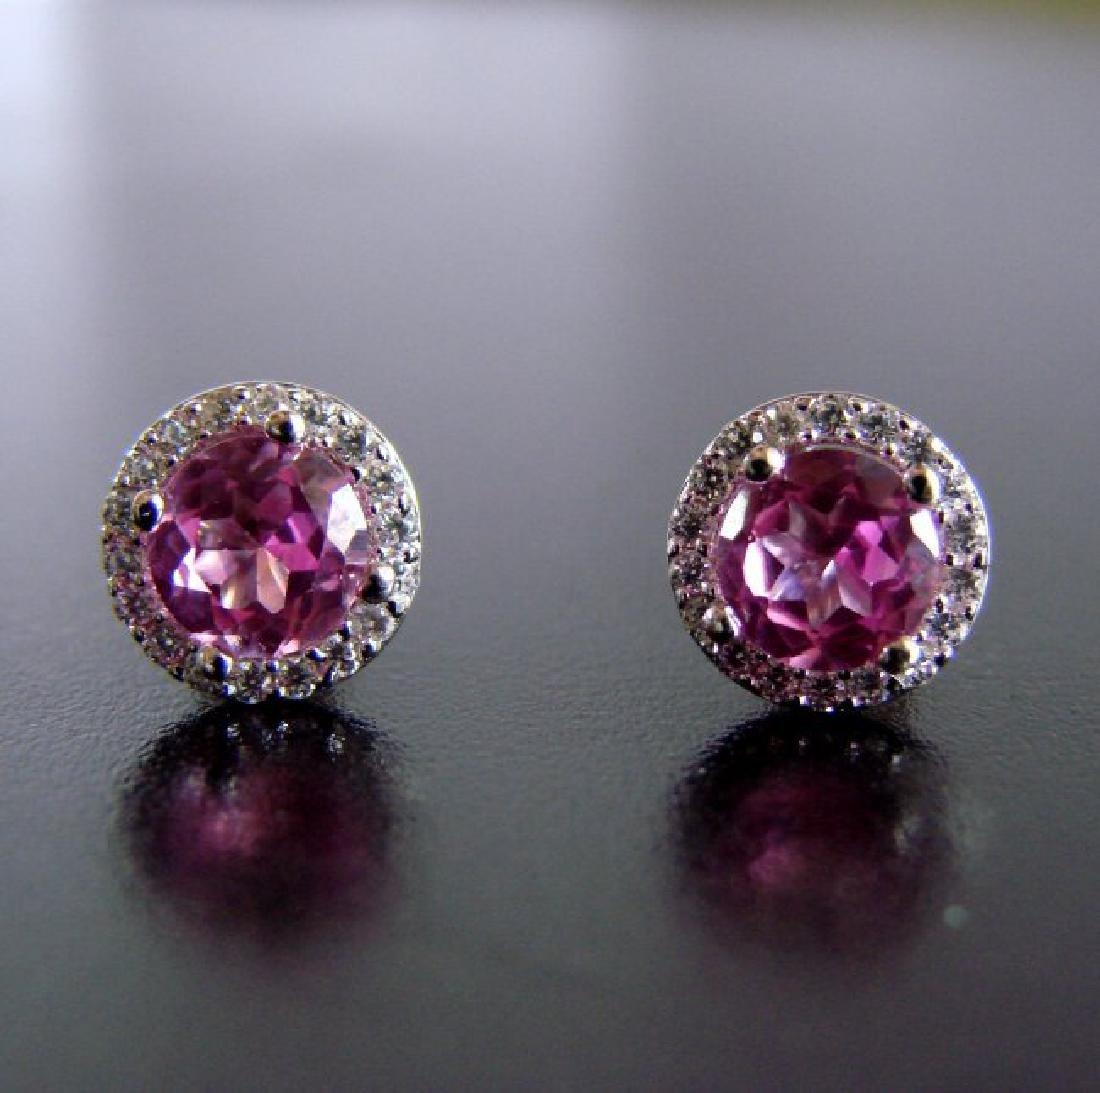 Creation Diamond & Pink Topaz Earrings 2.36Ct 18k W/g